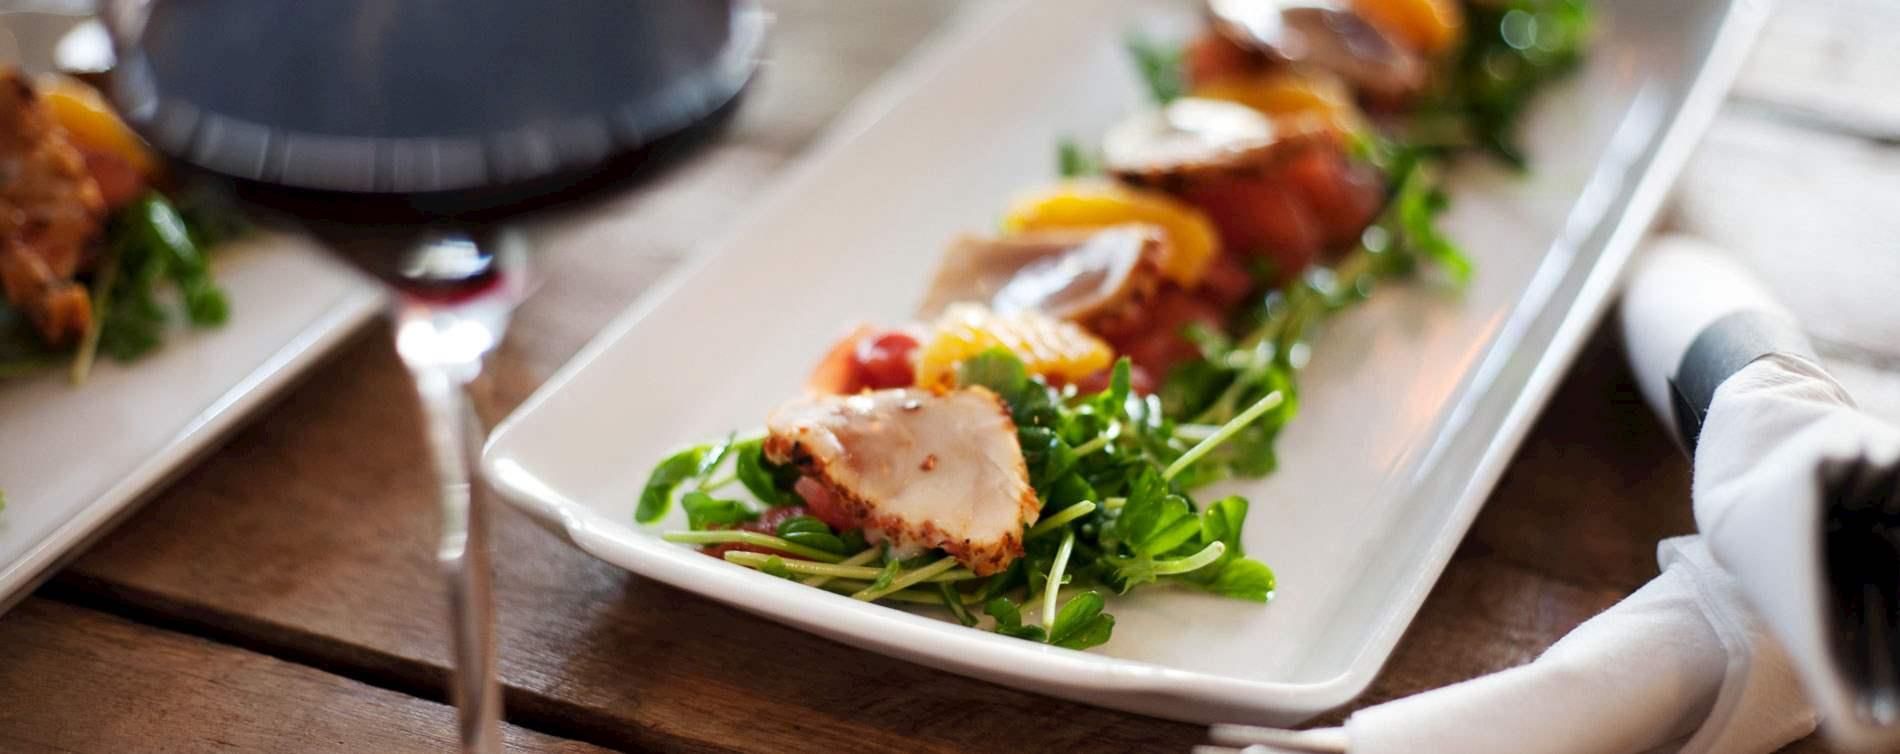 Dining at BEST WESTERN Sonoma Valley Inn & Krug Event Center, California